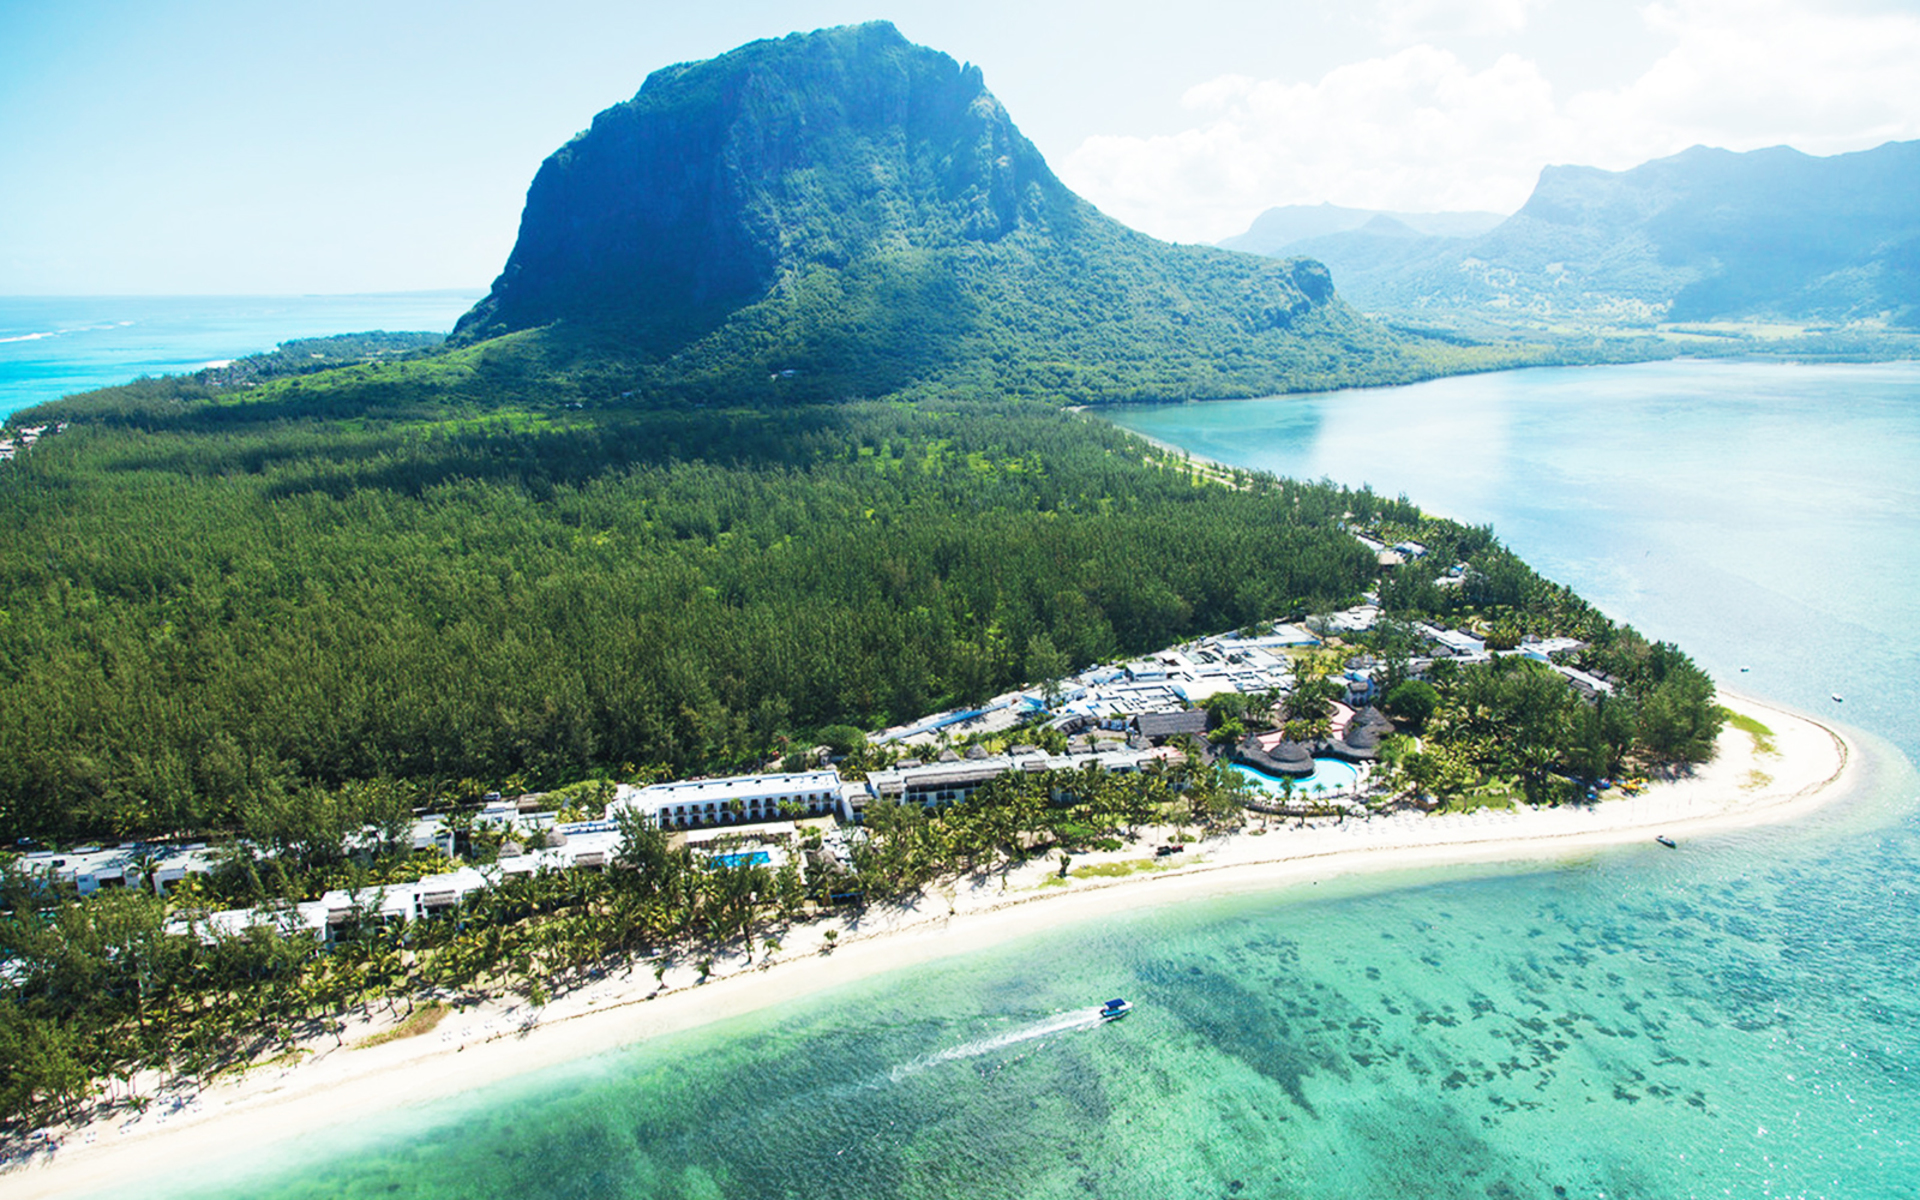 Buscar vuelos a Mauricio